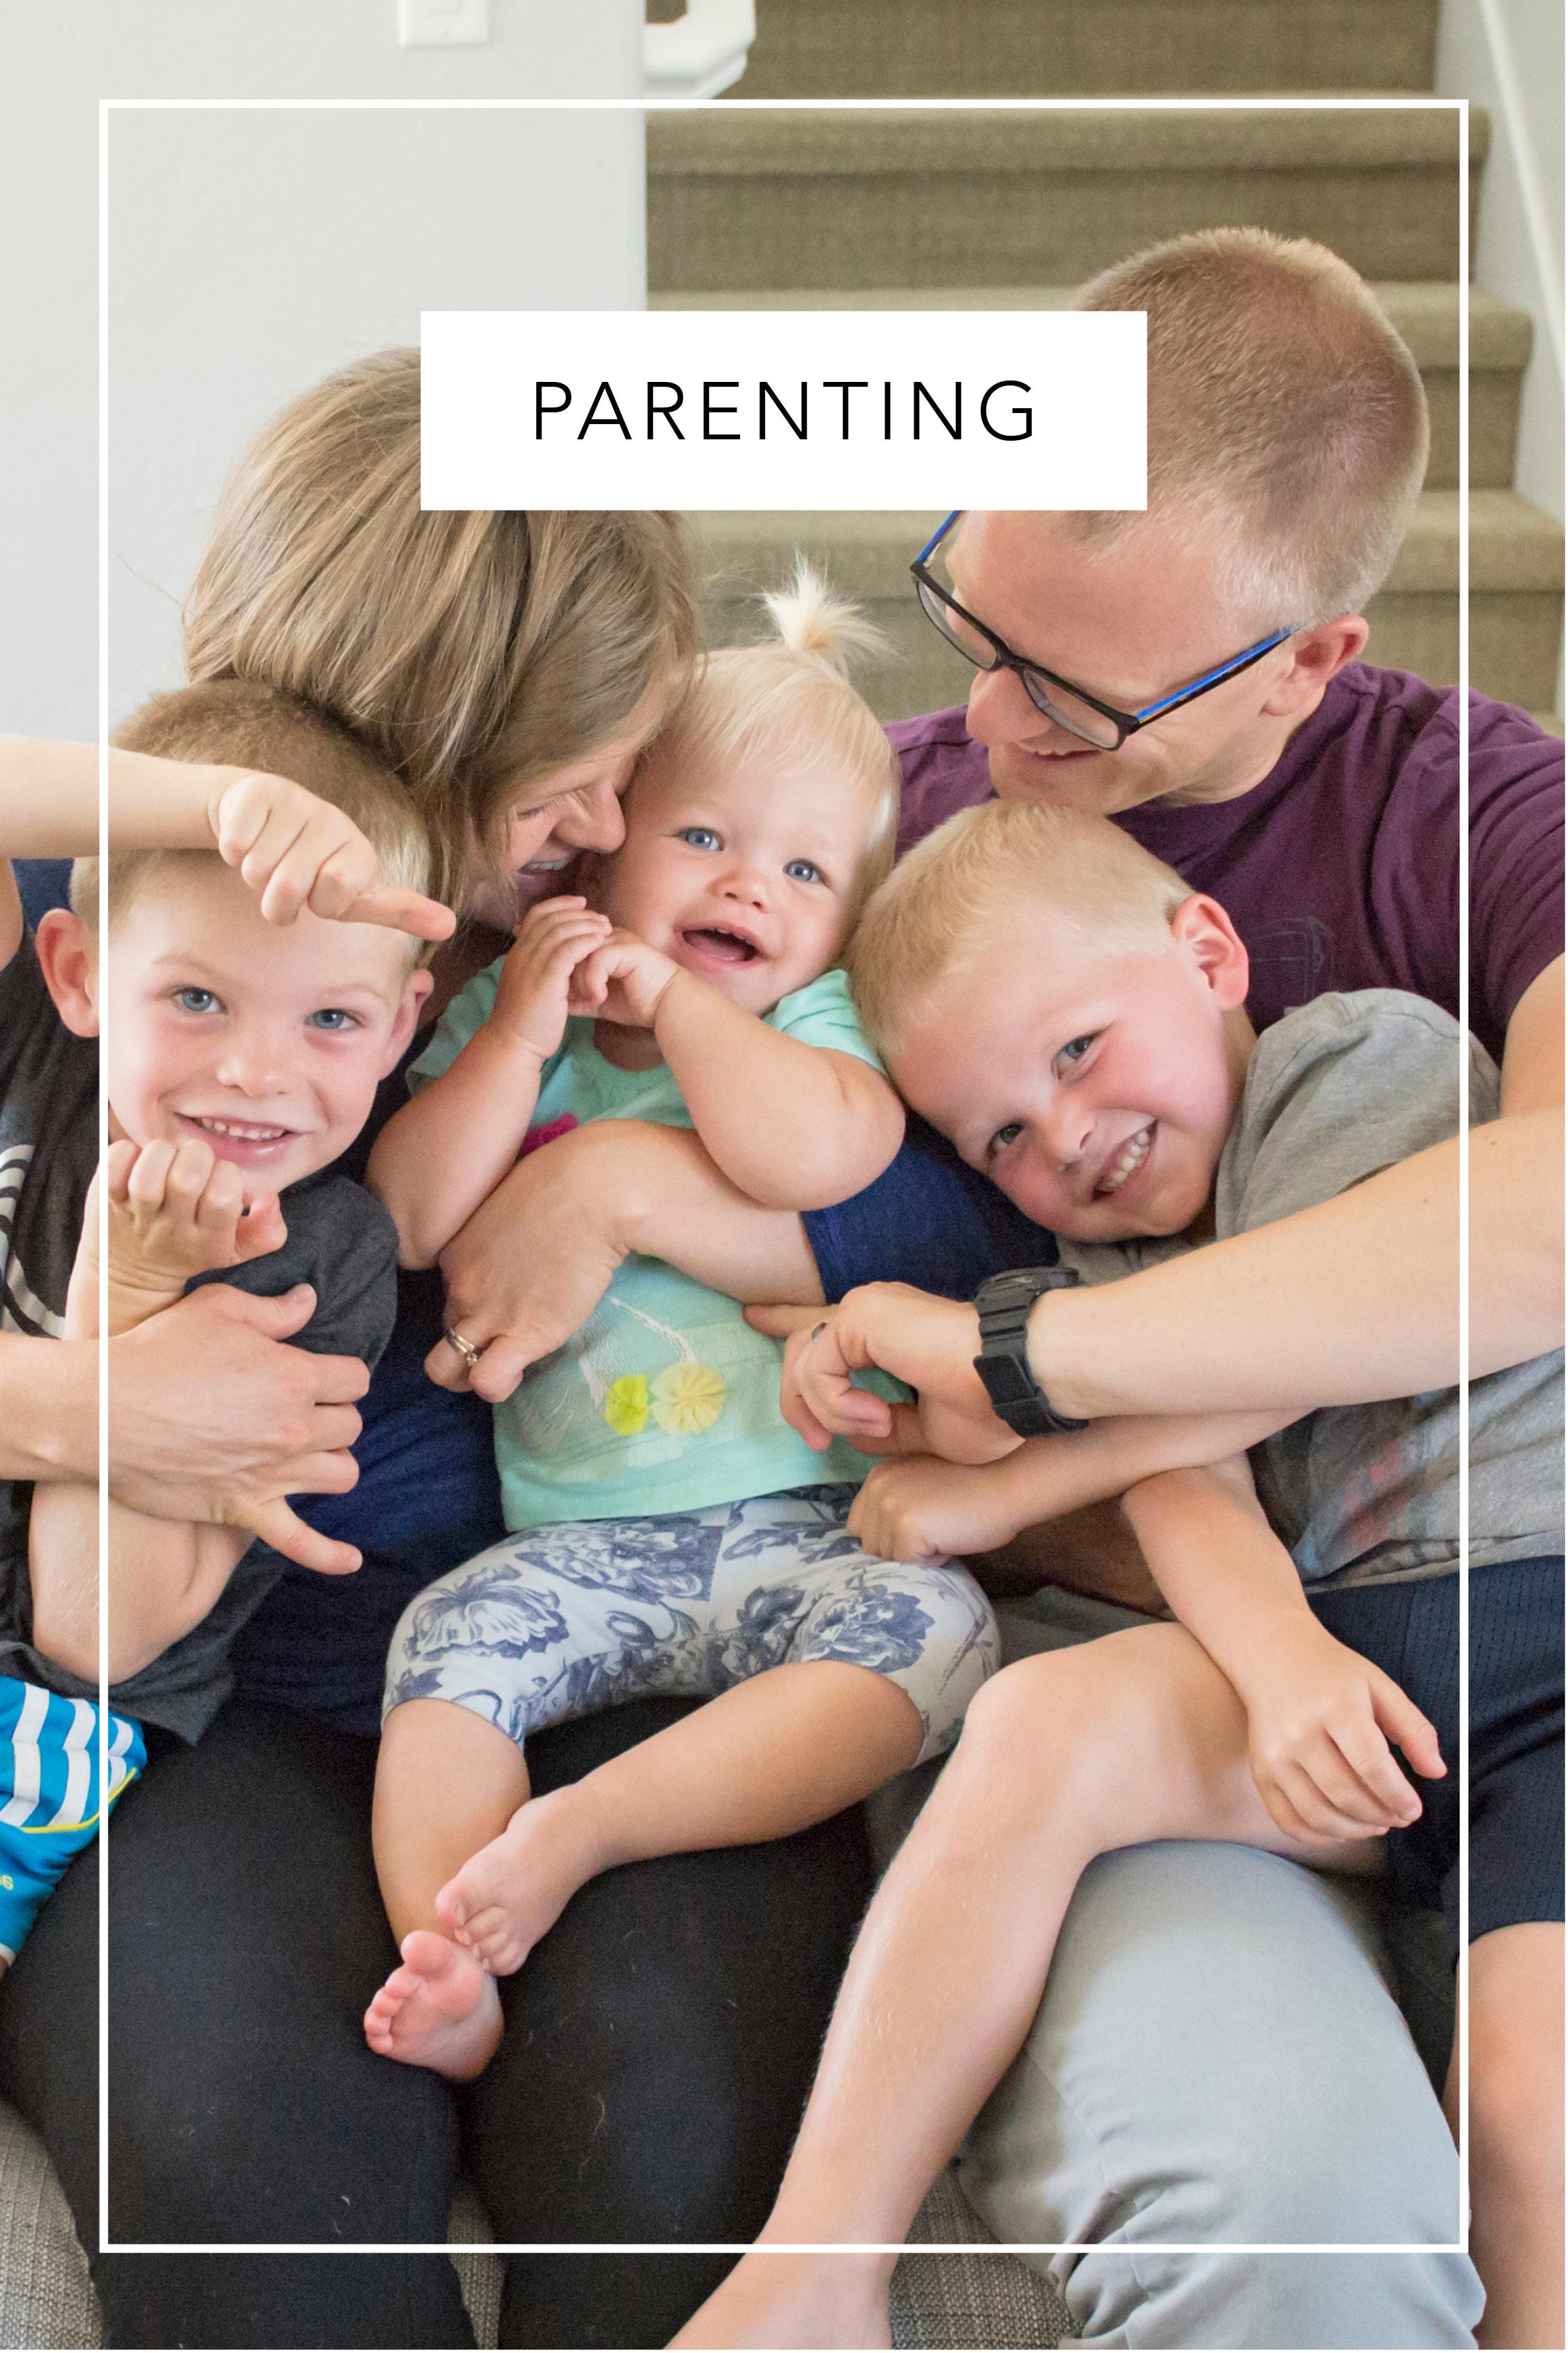 smallseed_parenting.jpg